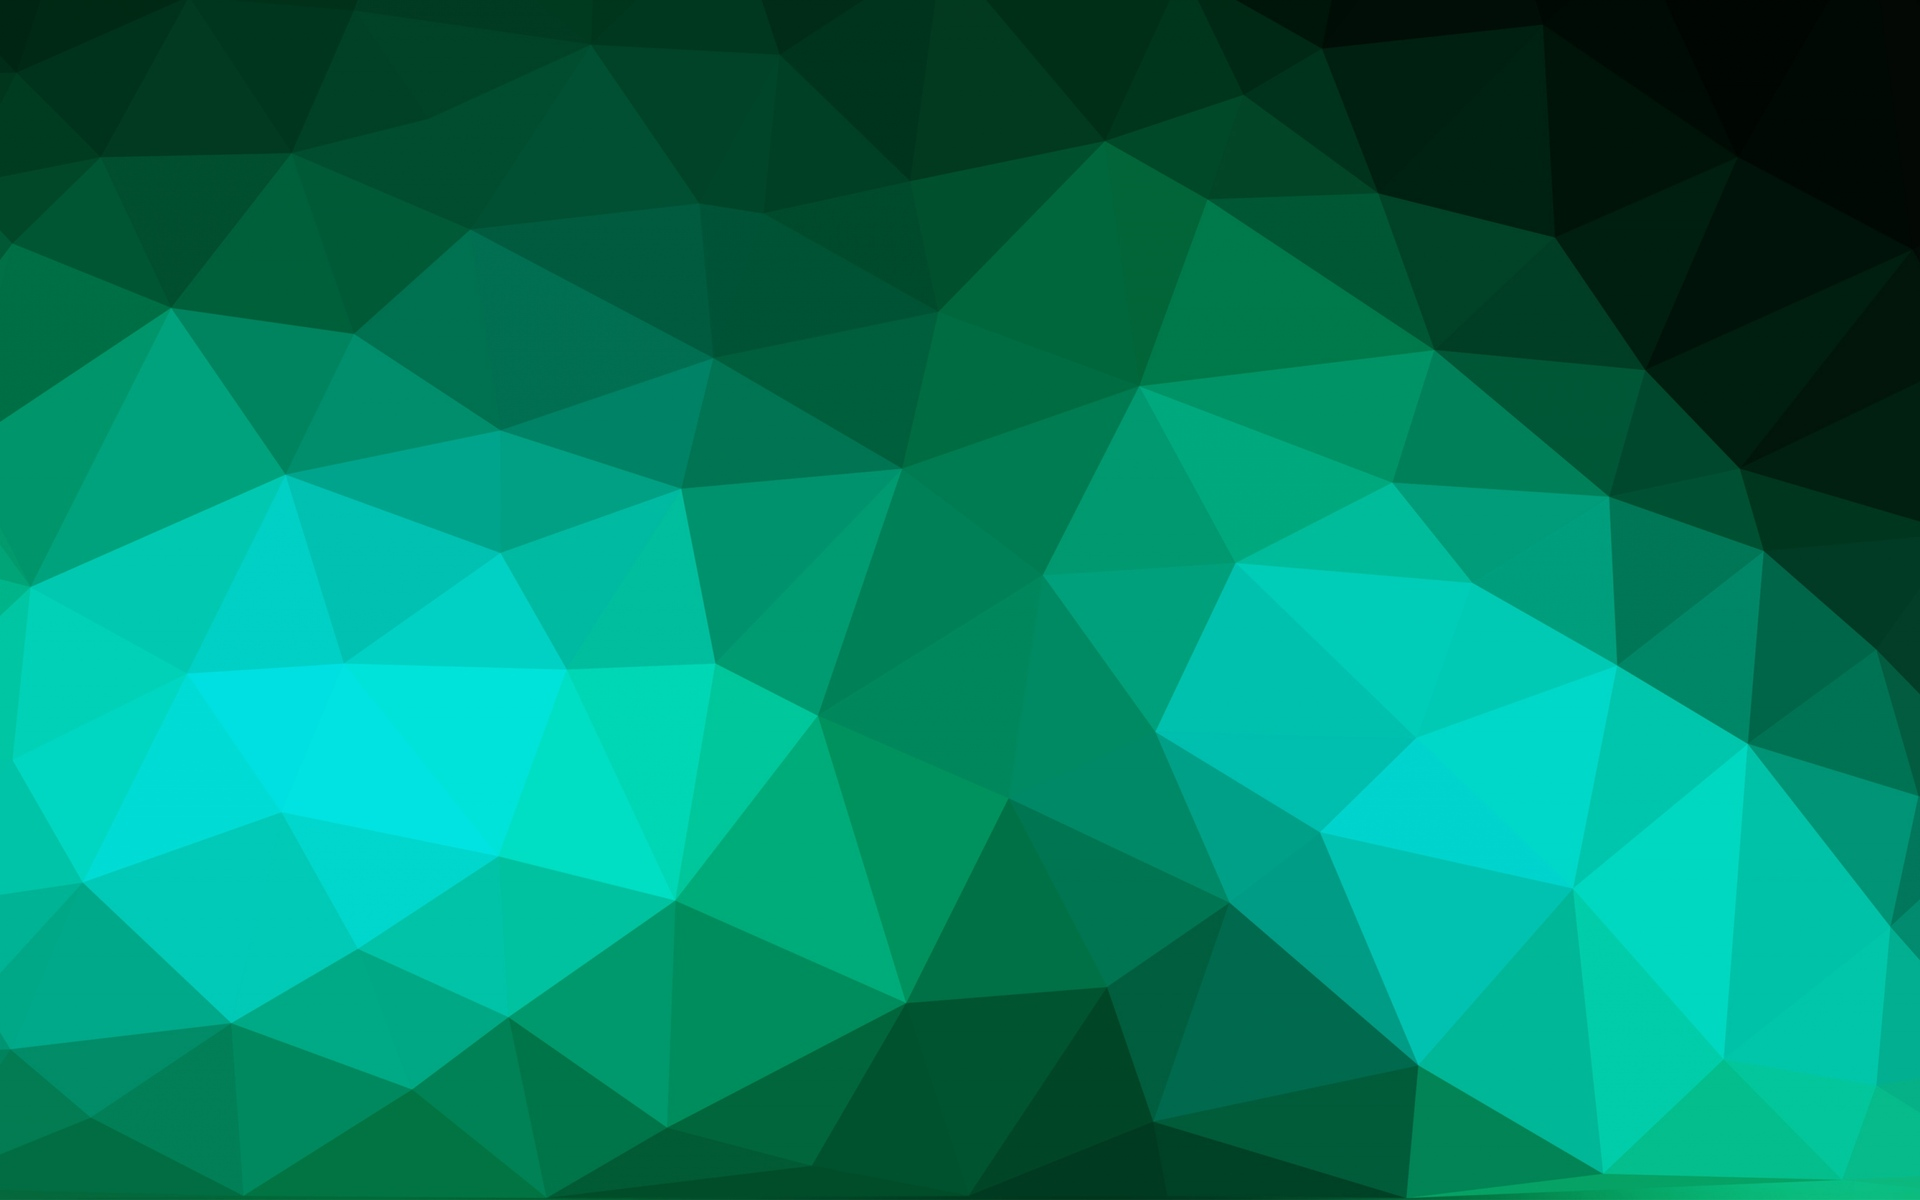 polygon-texture.jpg